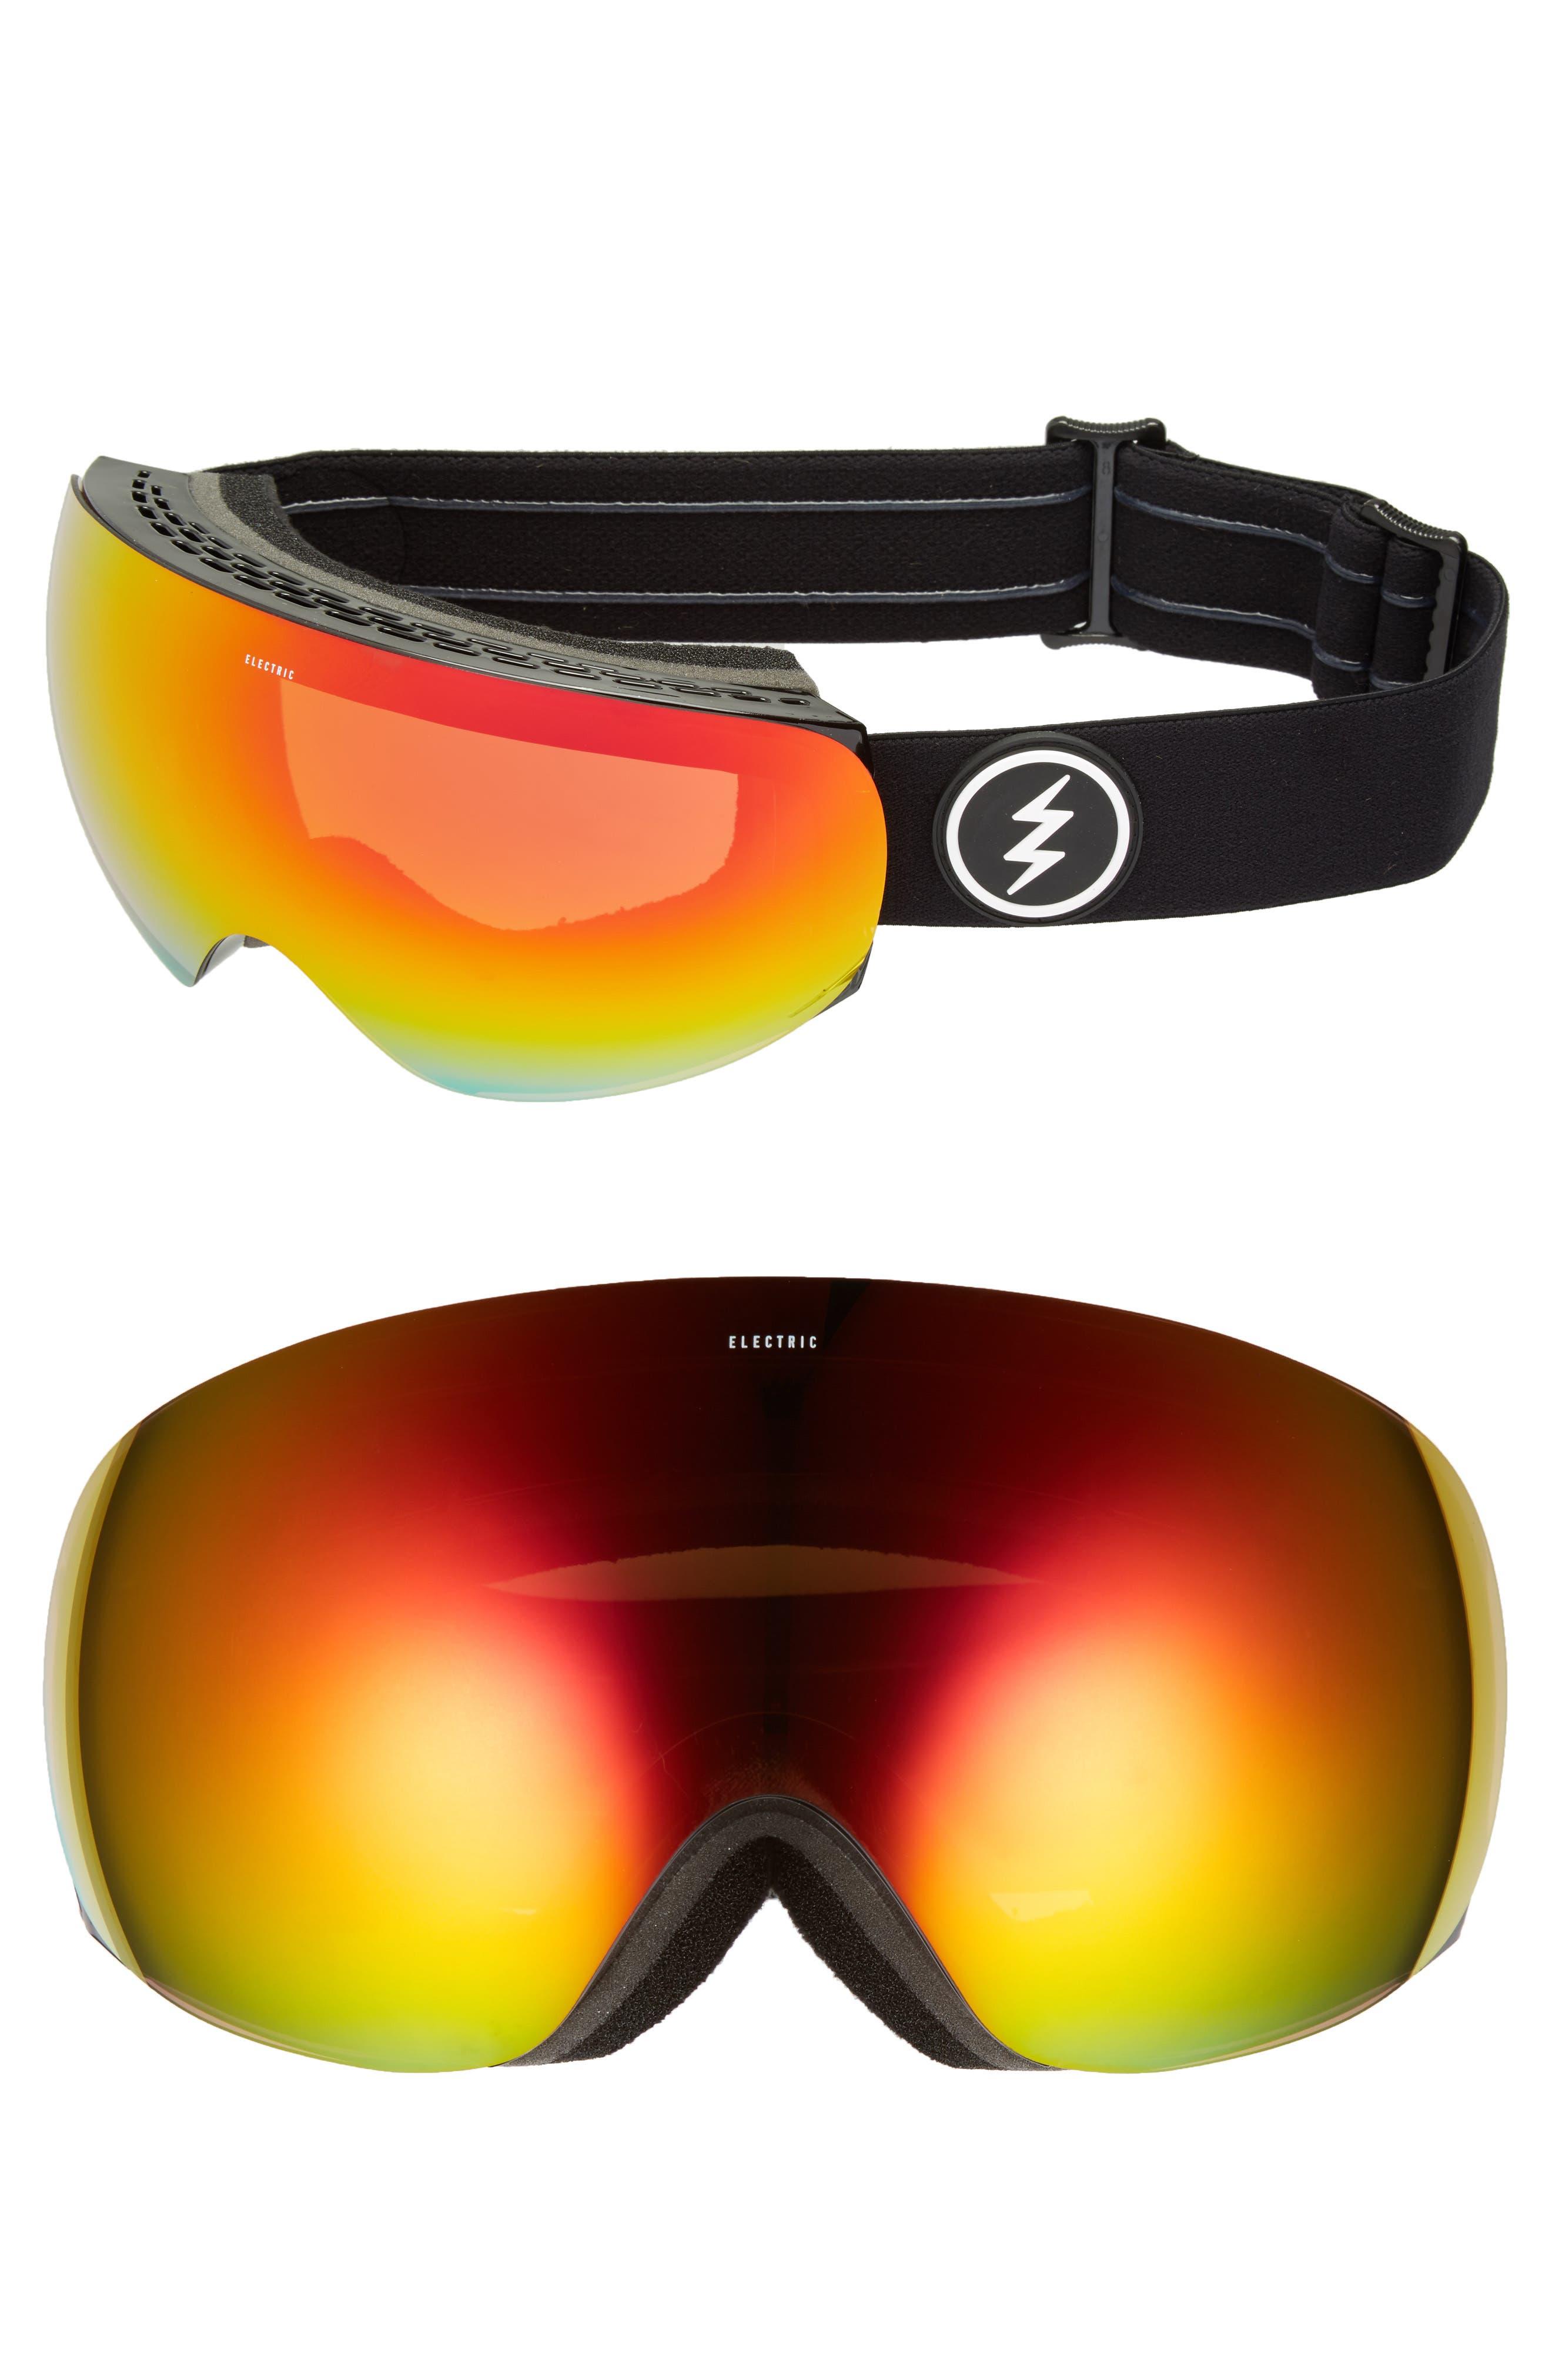 EG3.5 Snow Goggles,                             Main thumbnail 1, color,